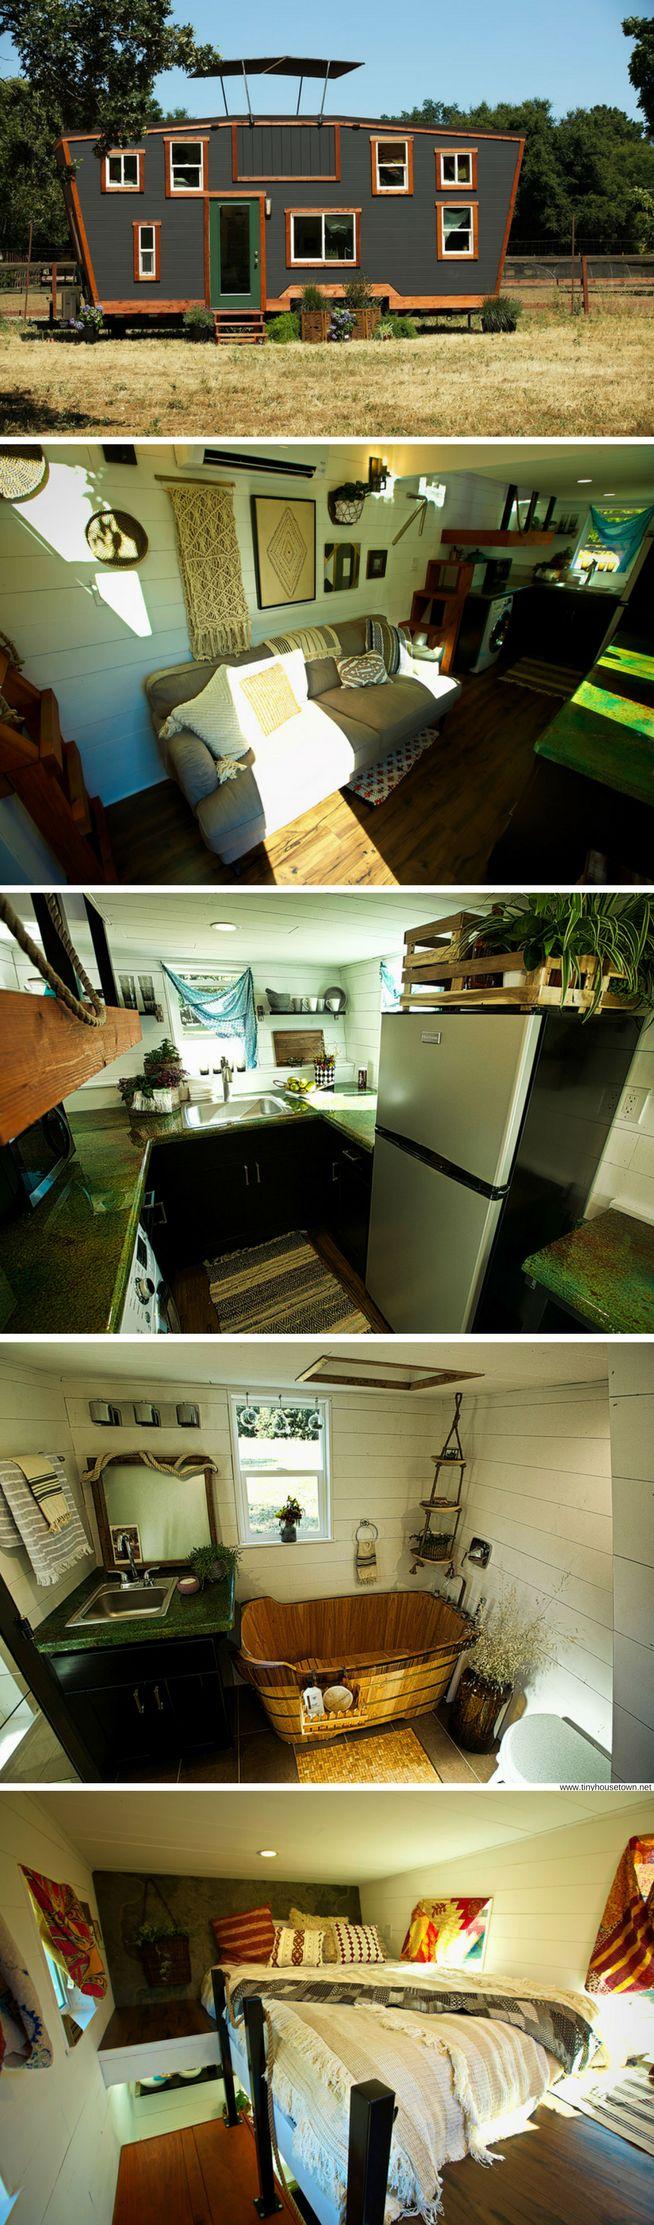 Schooner Tiny House (200 Sq Ft)